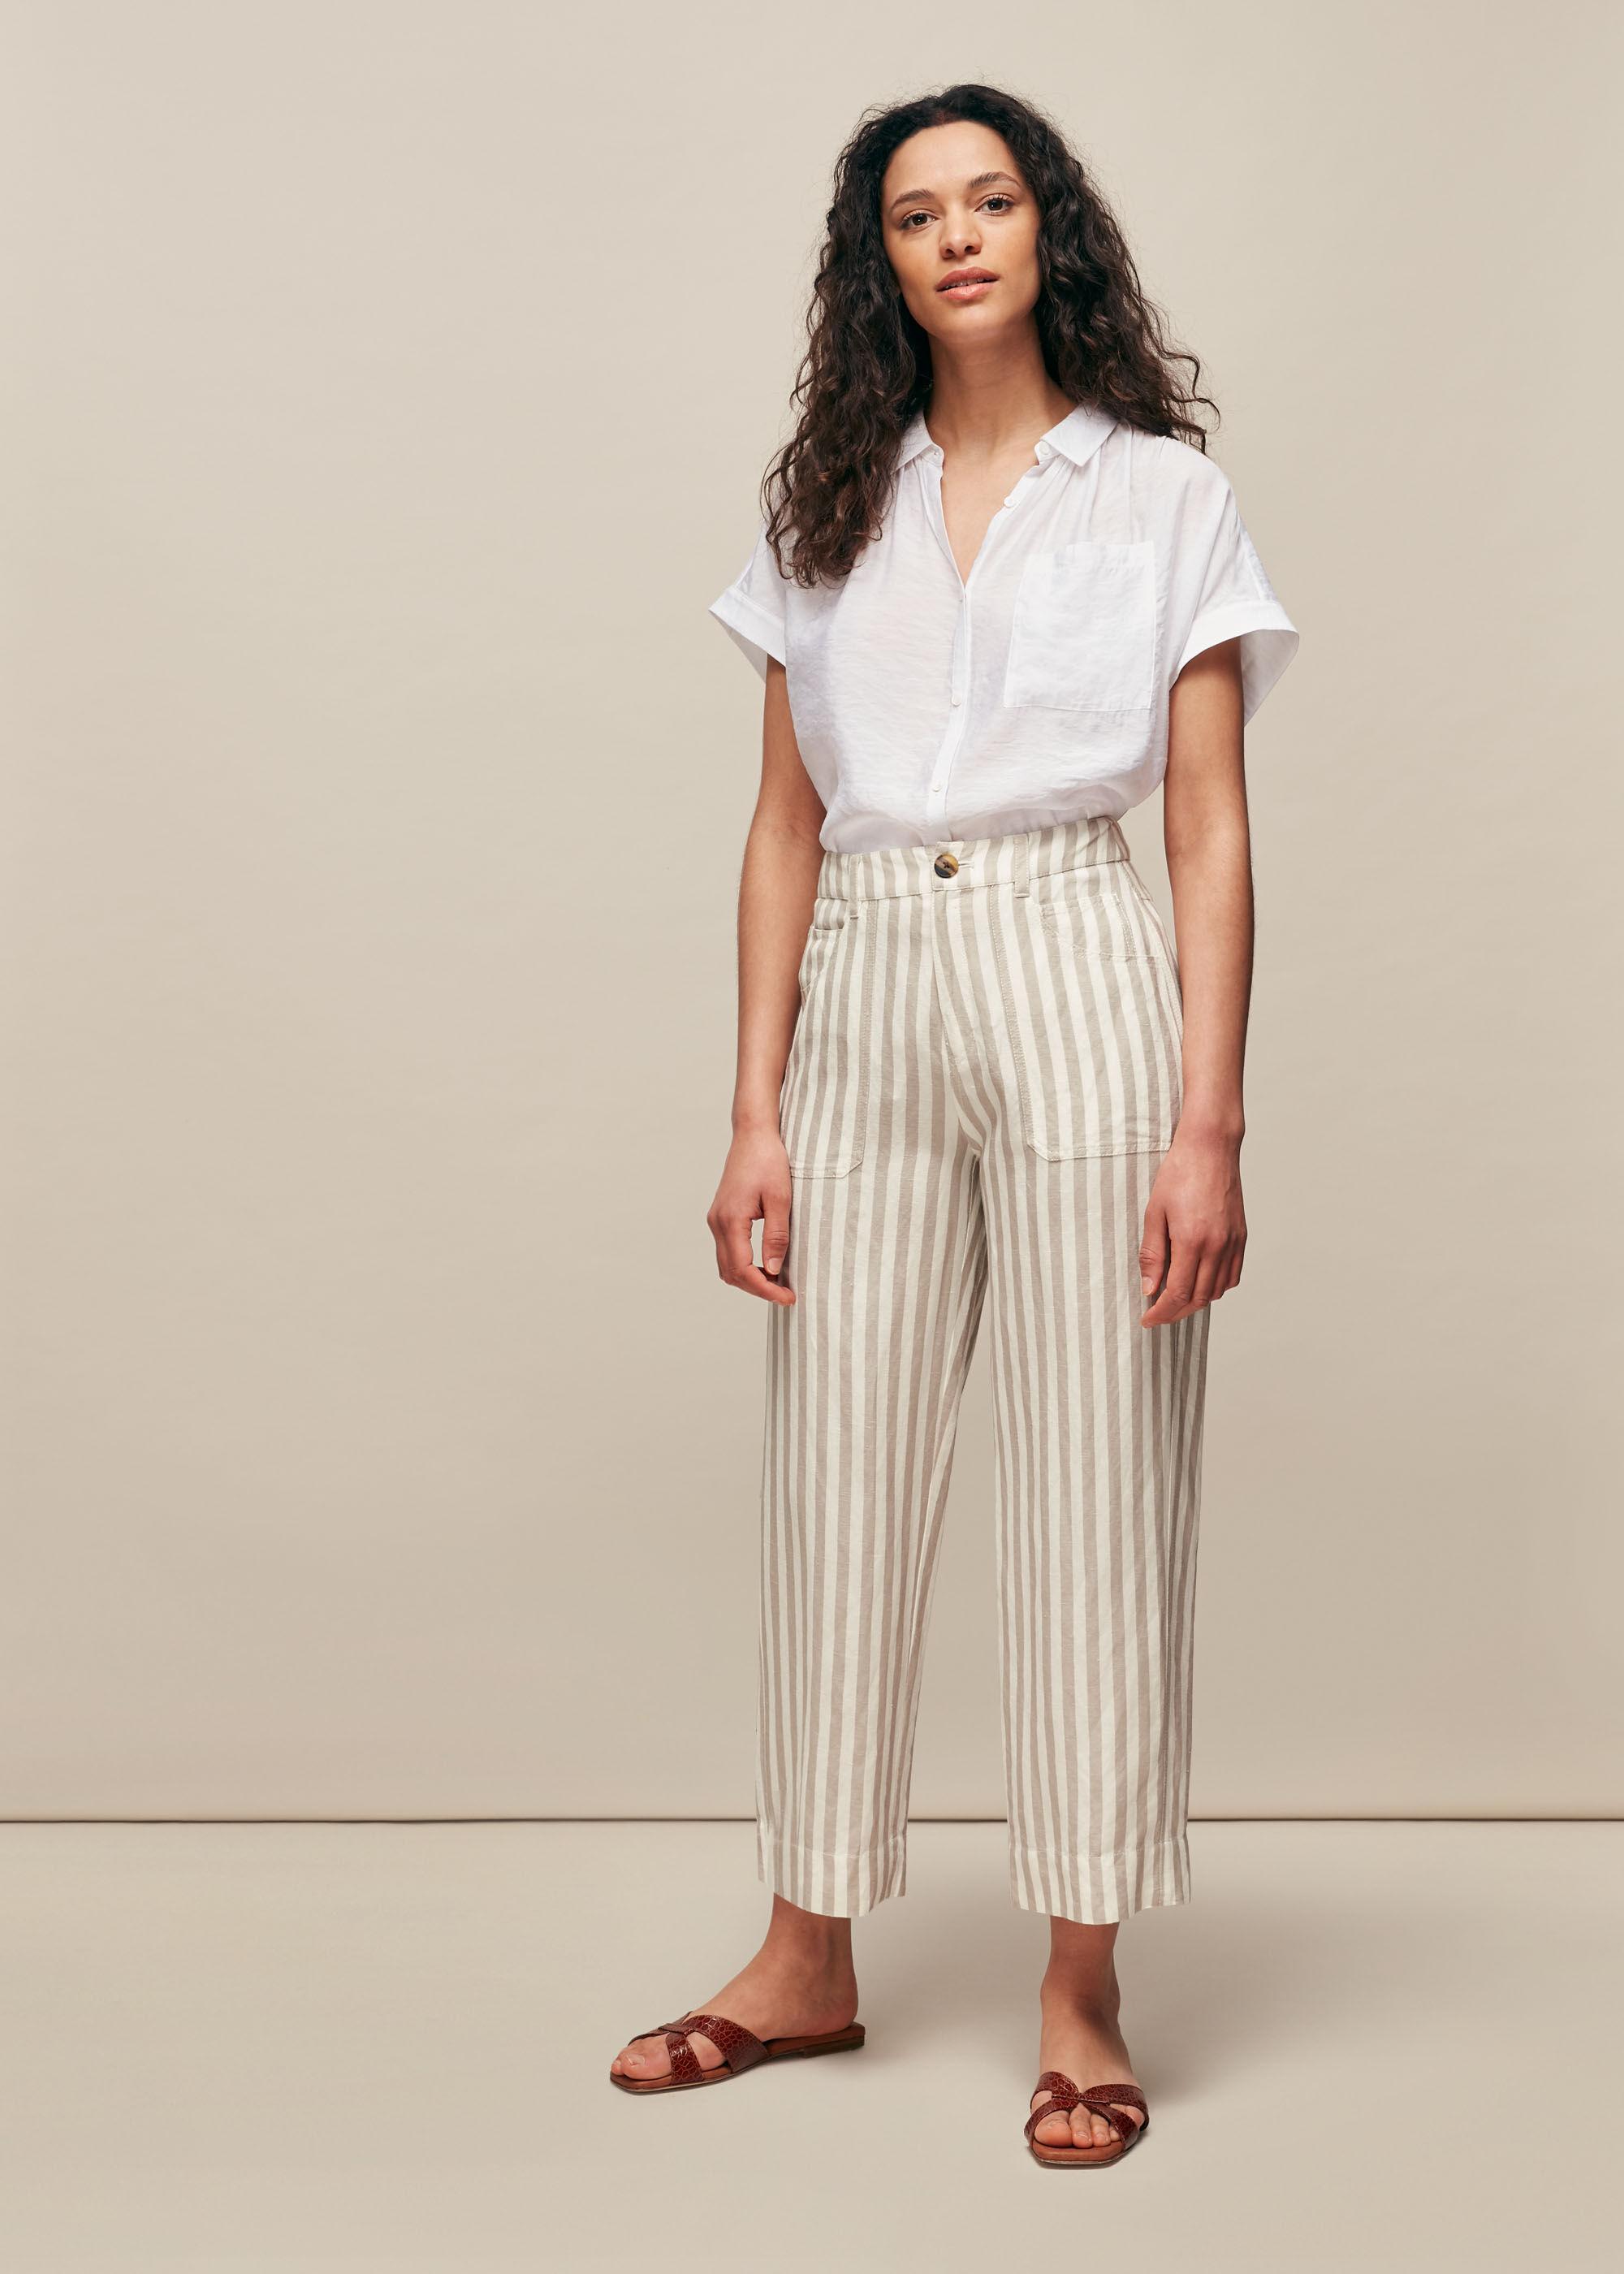 Must Crepe Crop Trouser sz 10 12 Navy Ivory Black NEW 14 16 uk pink